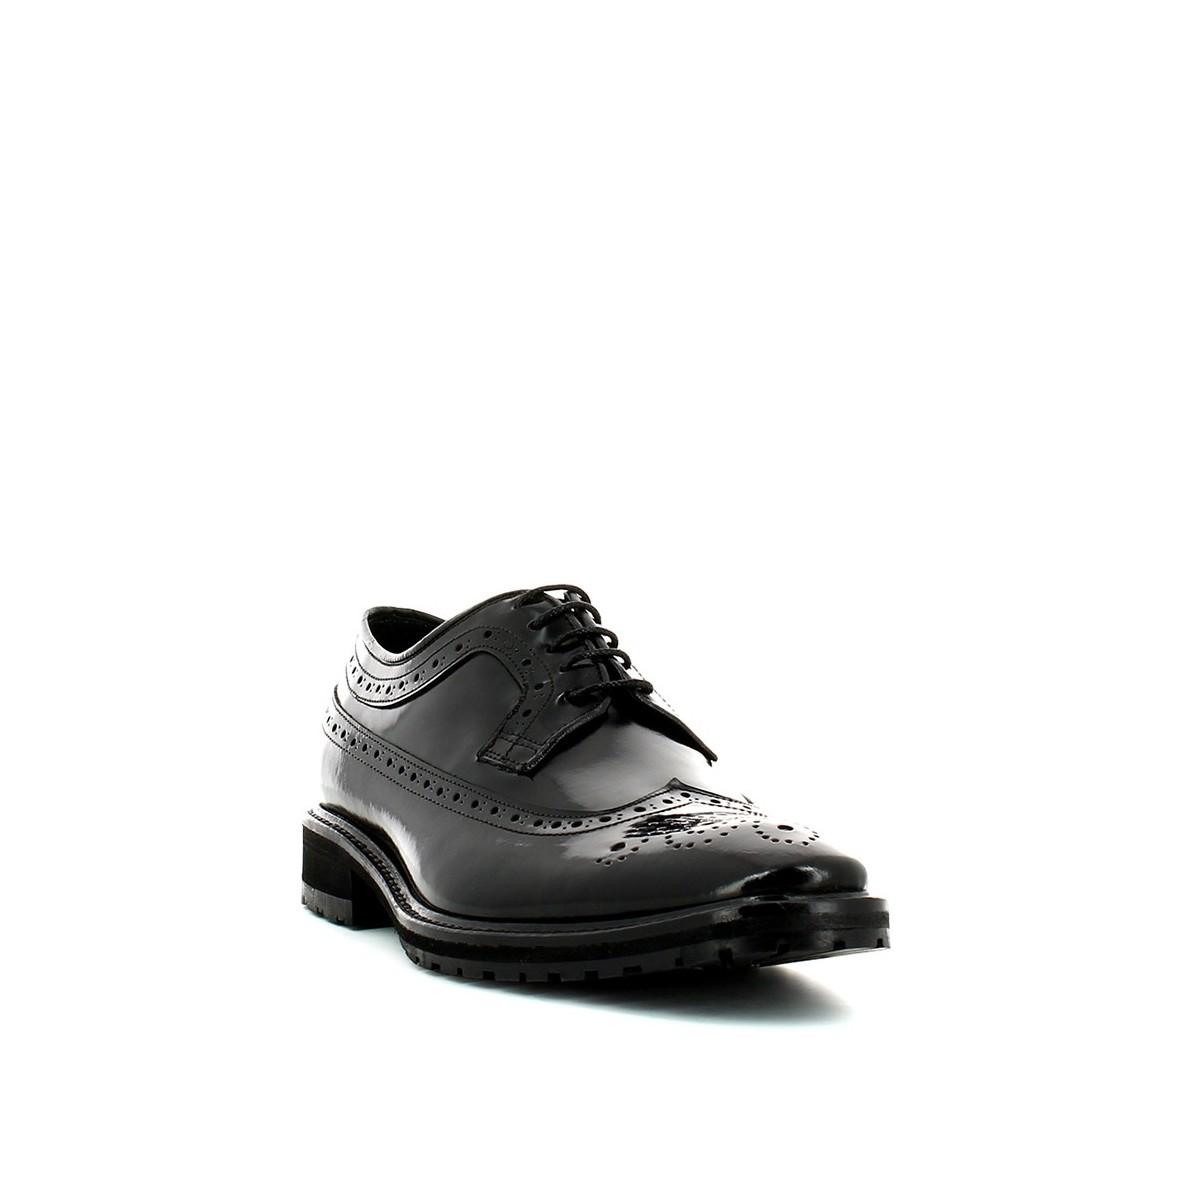 sapatos estilo derbies senhora